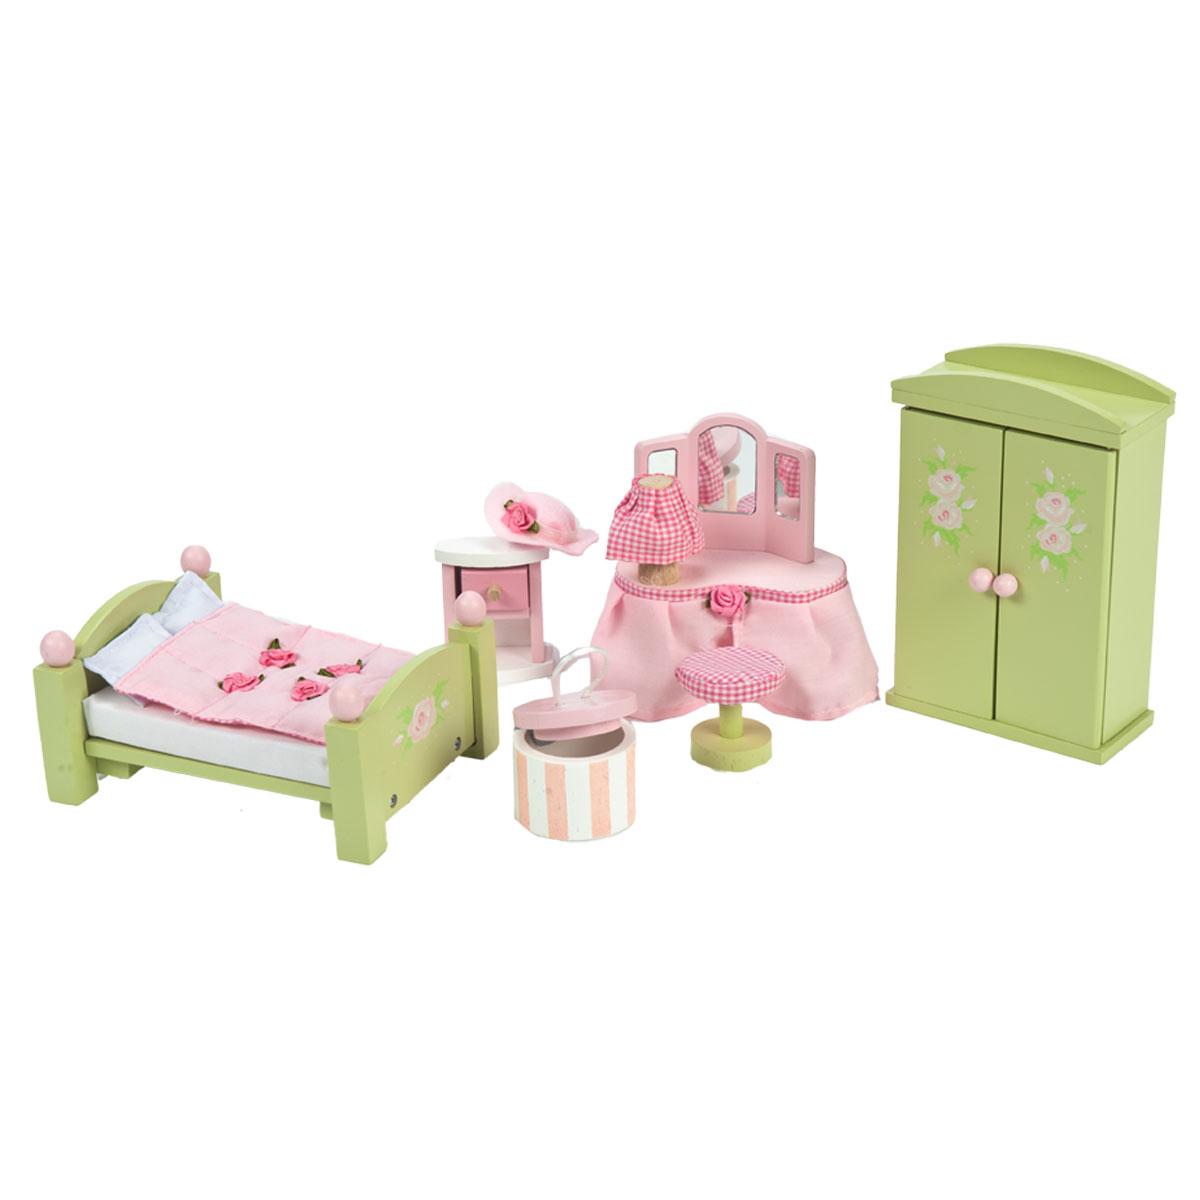 Le toy van daisylane slaapkamer   me057   pirum